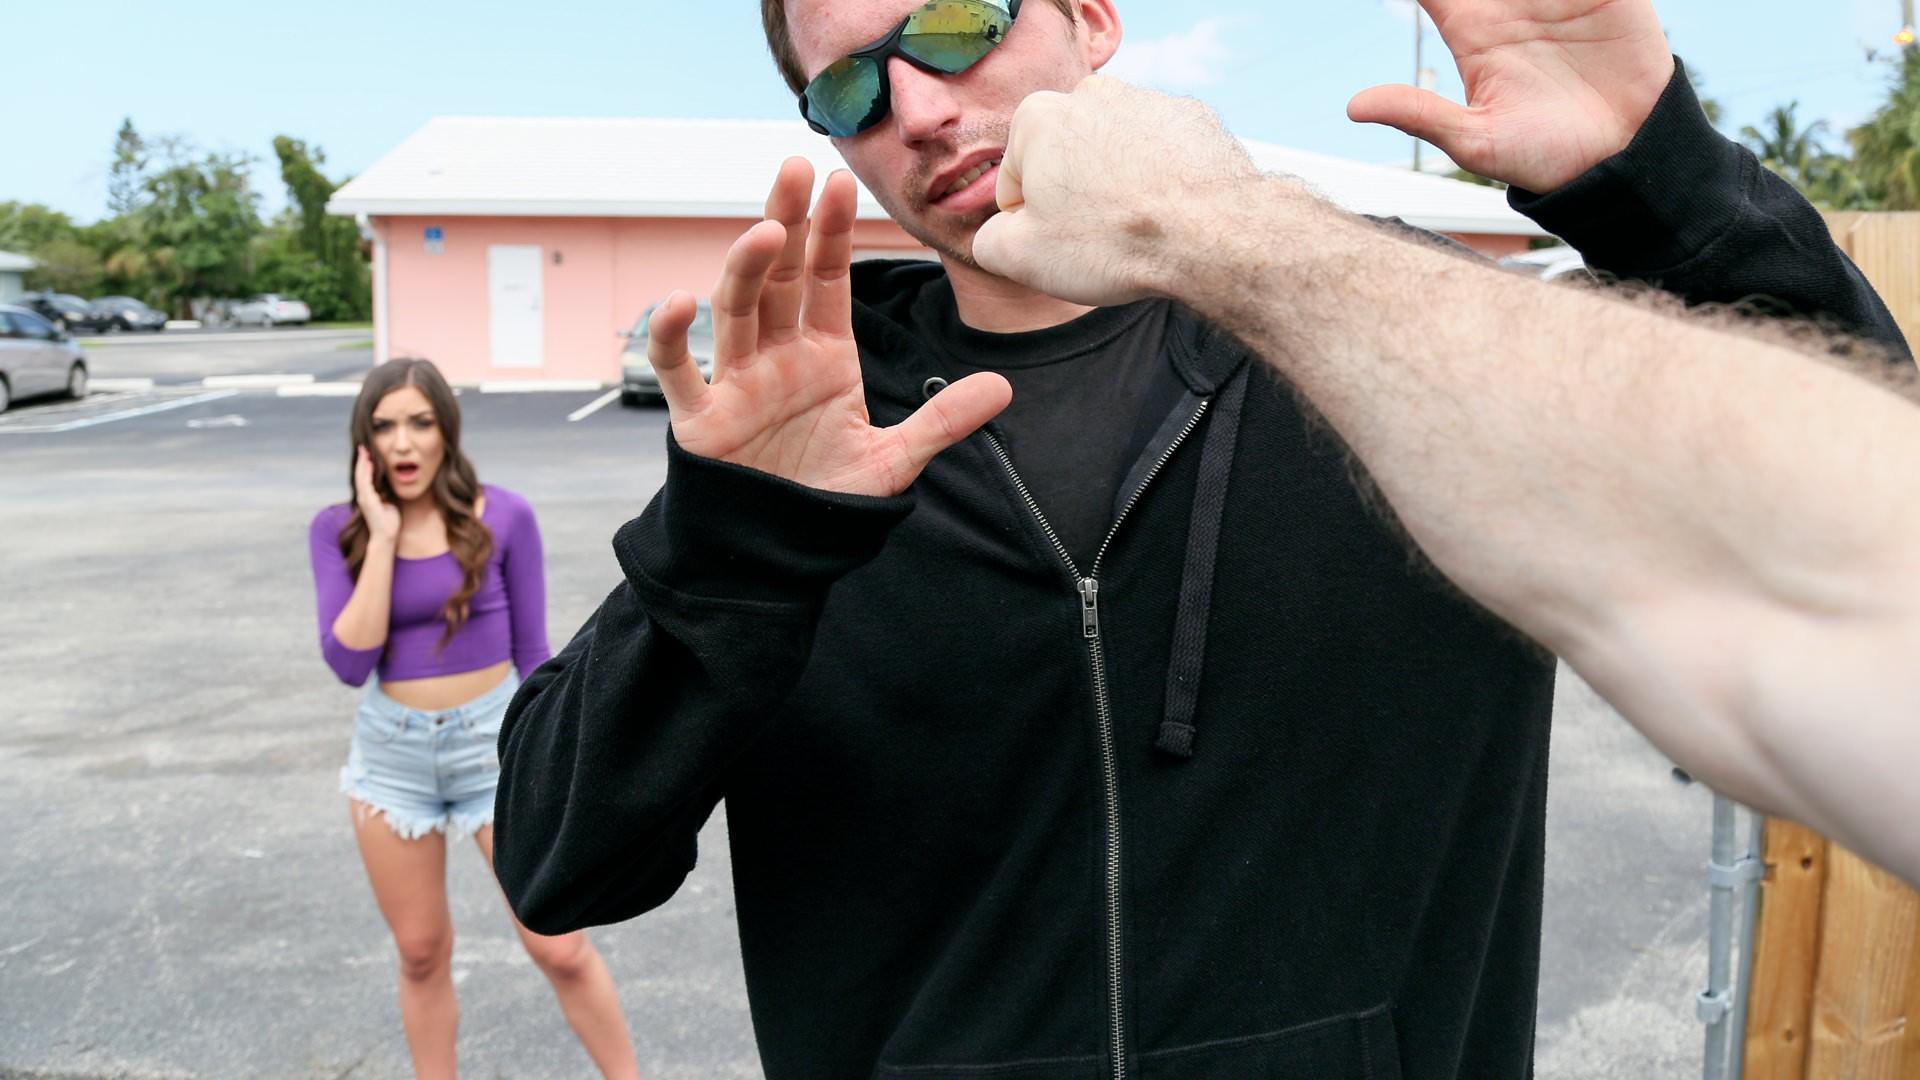 Purse Snatch - Stranded Teens